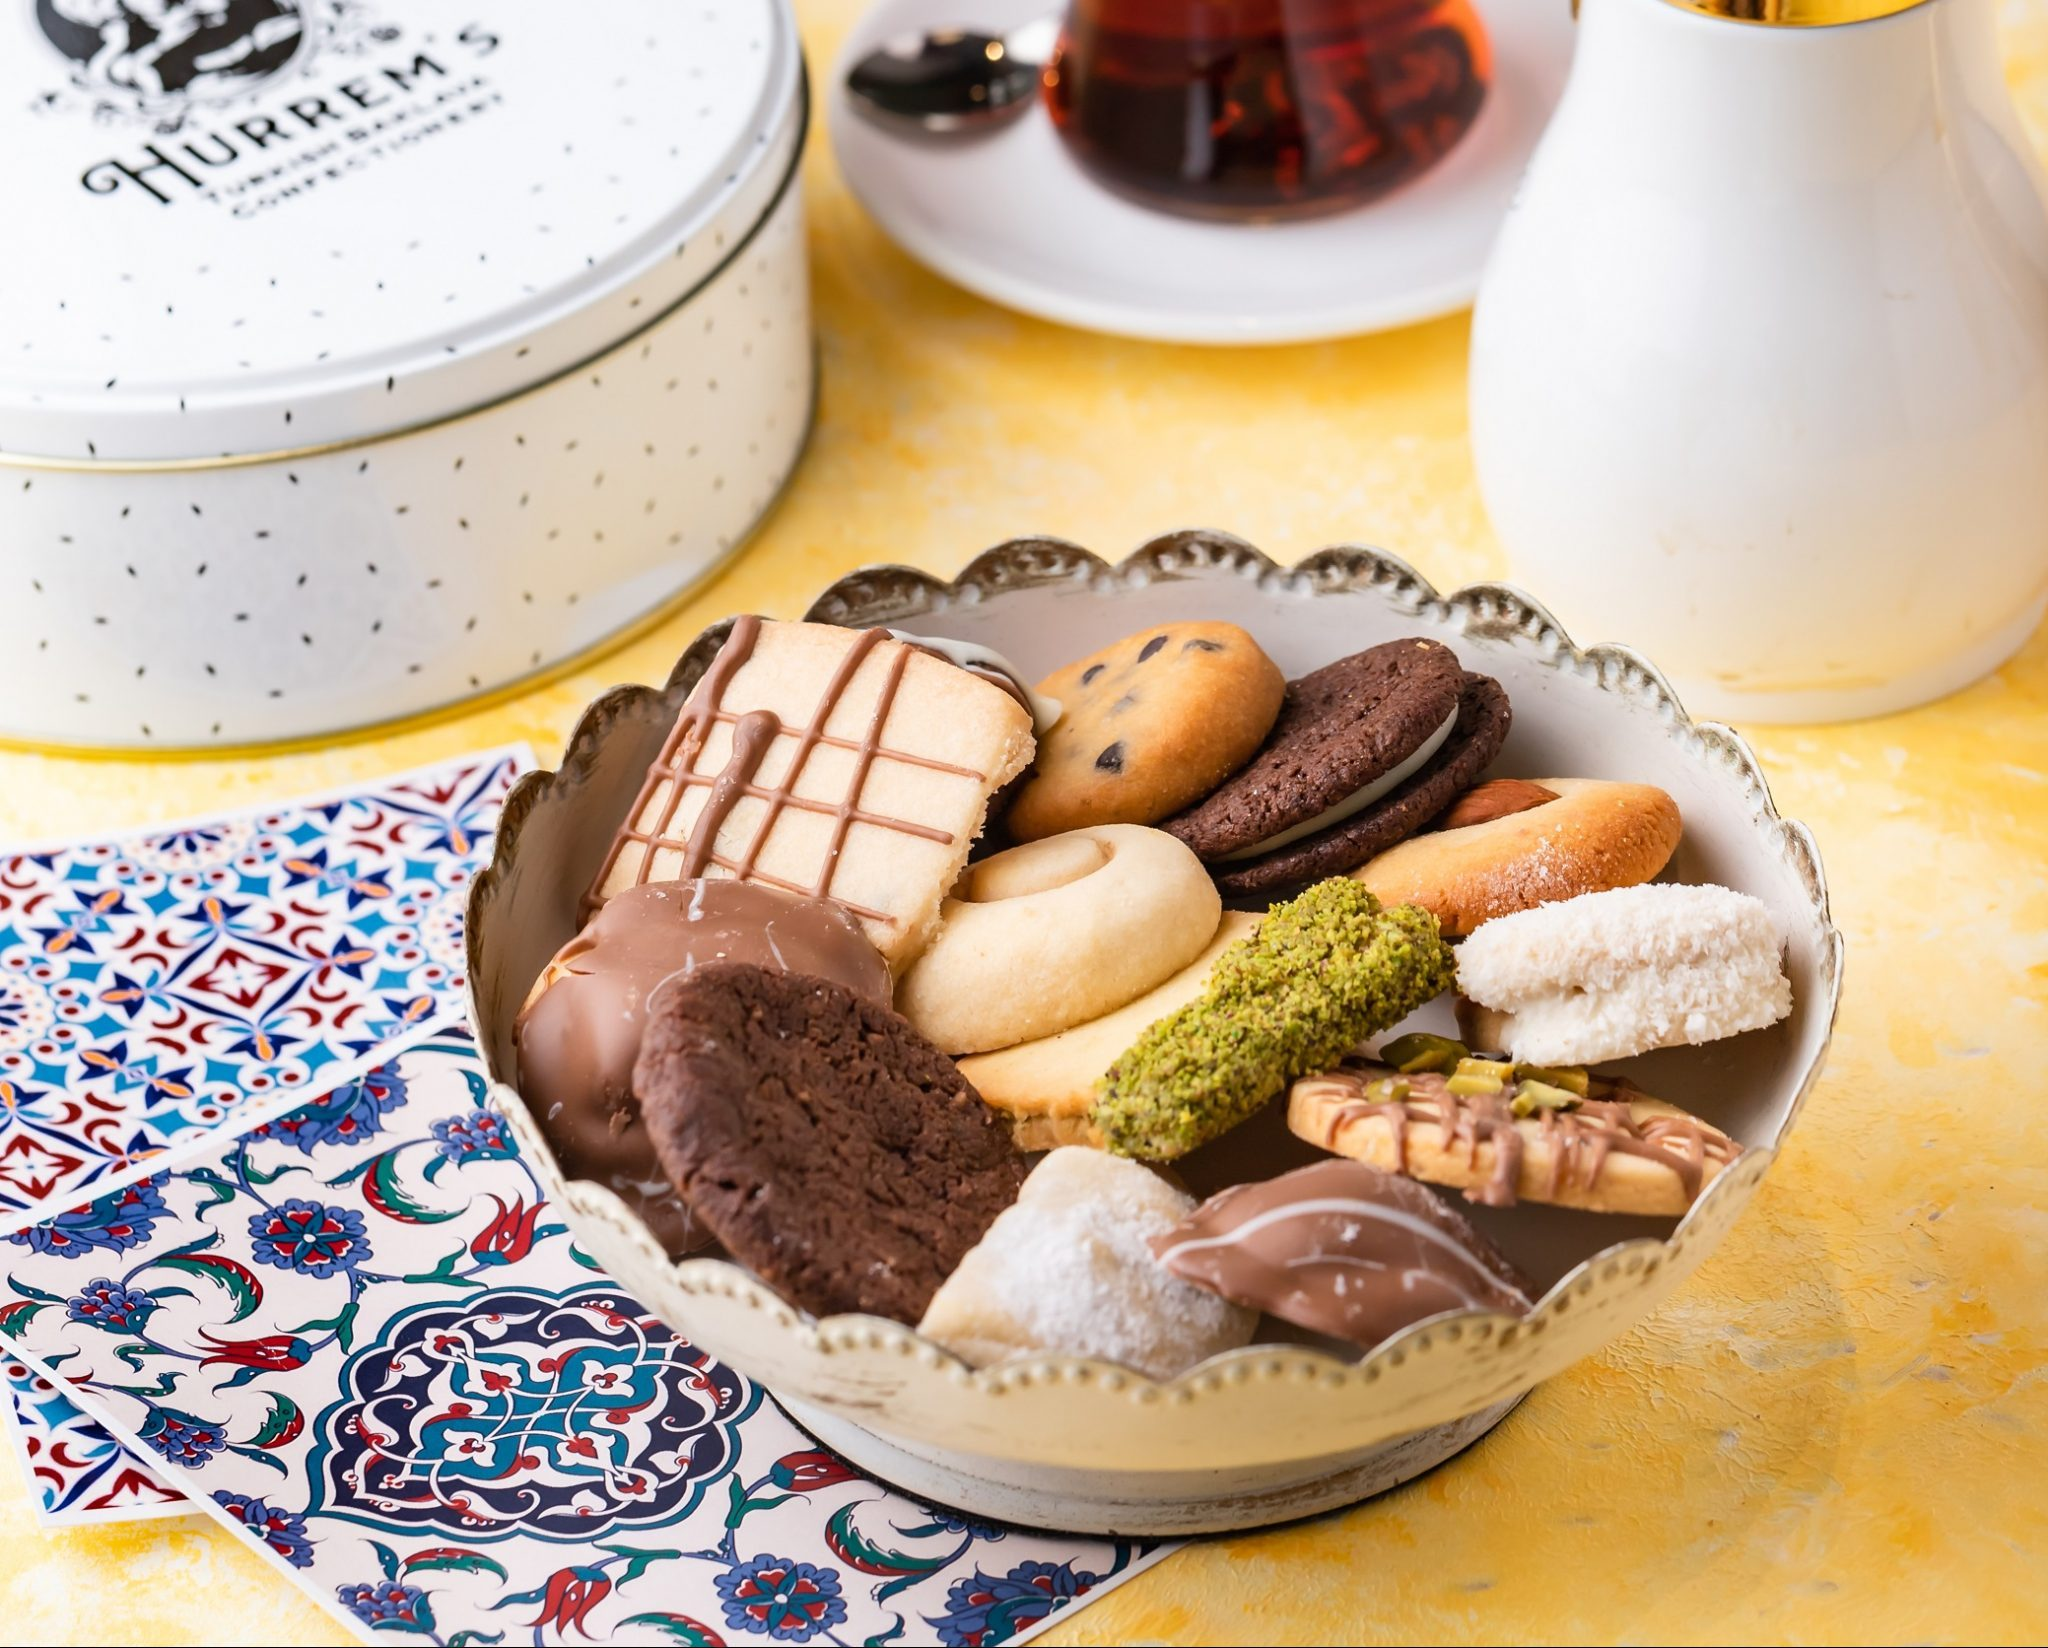 Turkish baklava brand Hurrem's Kurabiye